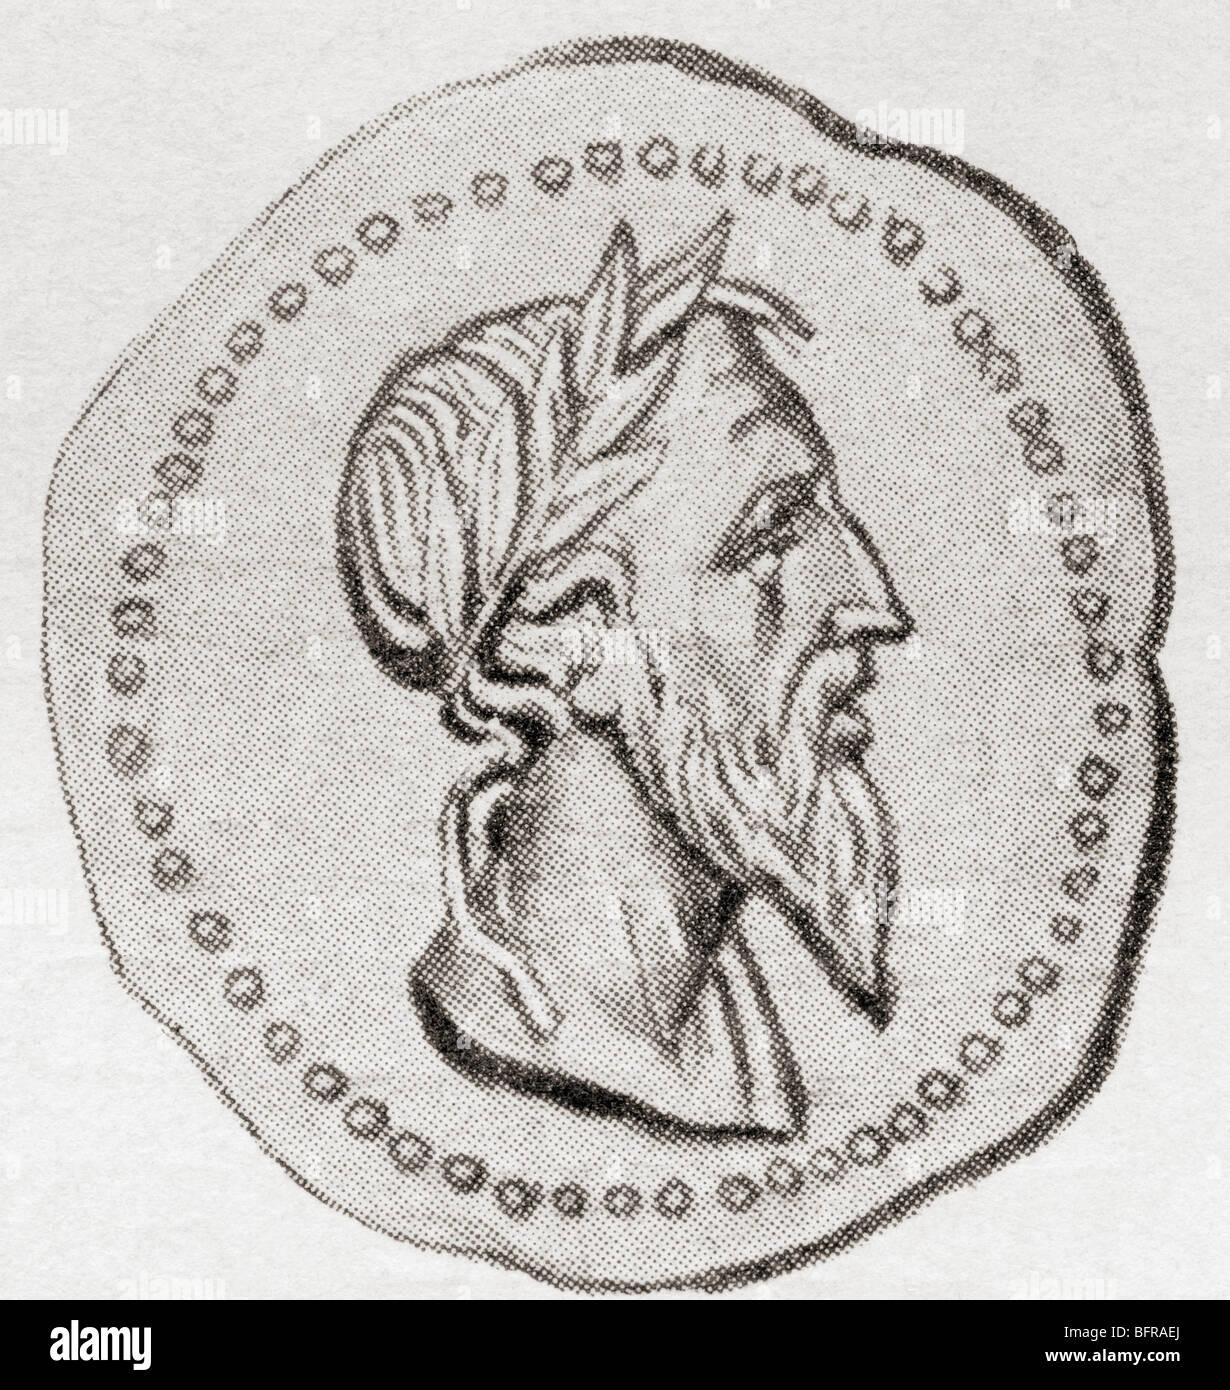 Romulus, c. 771 BC to c. 717 BC. Founder of Rome. - Stock Image